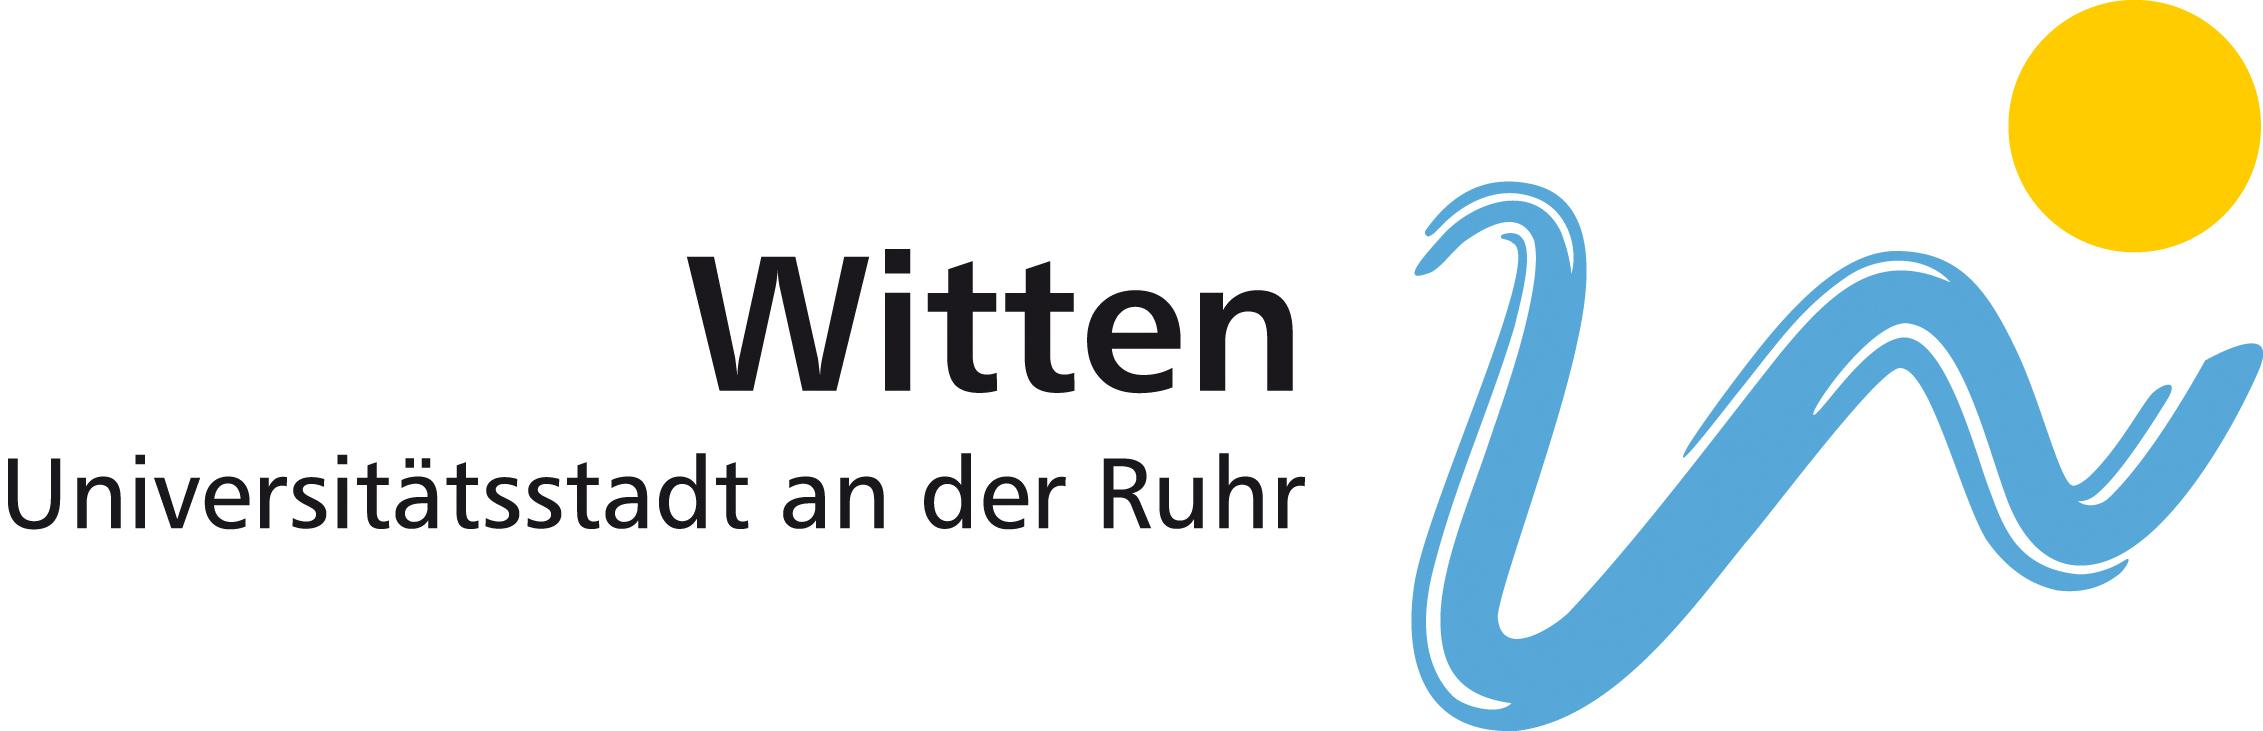 Witten - Universitätsstadt an der Ruhr